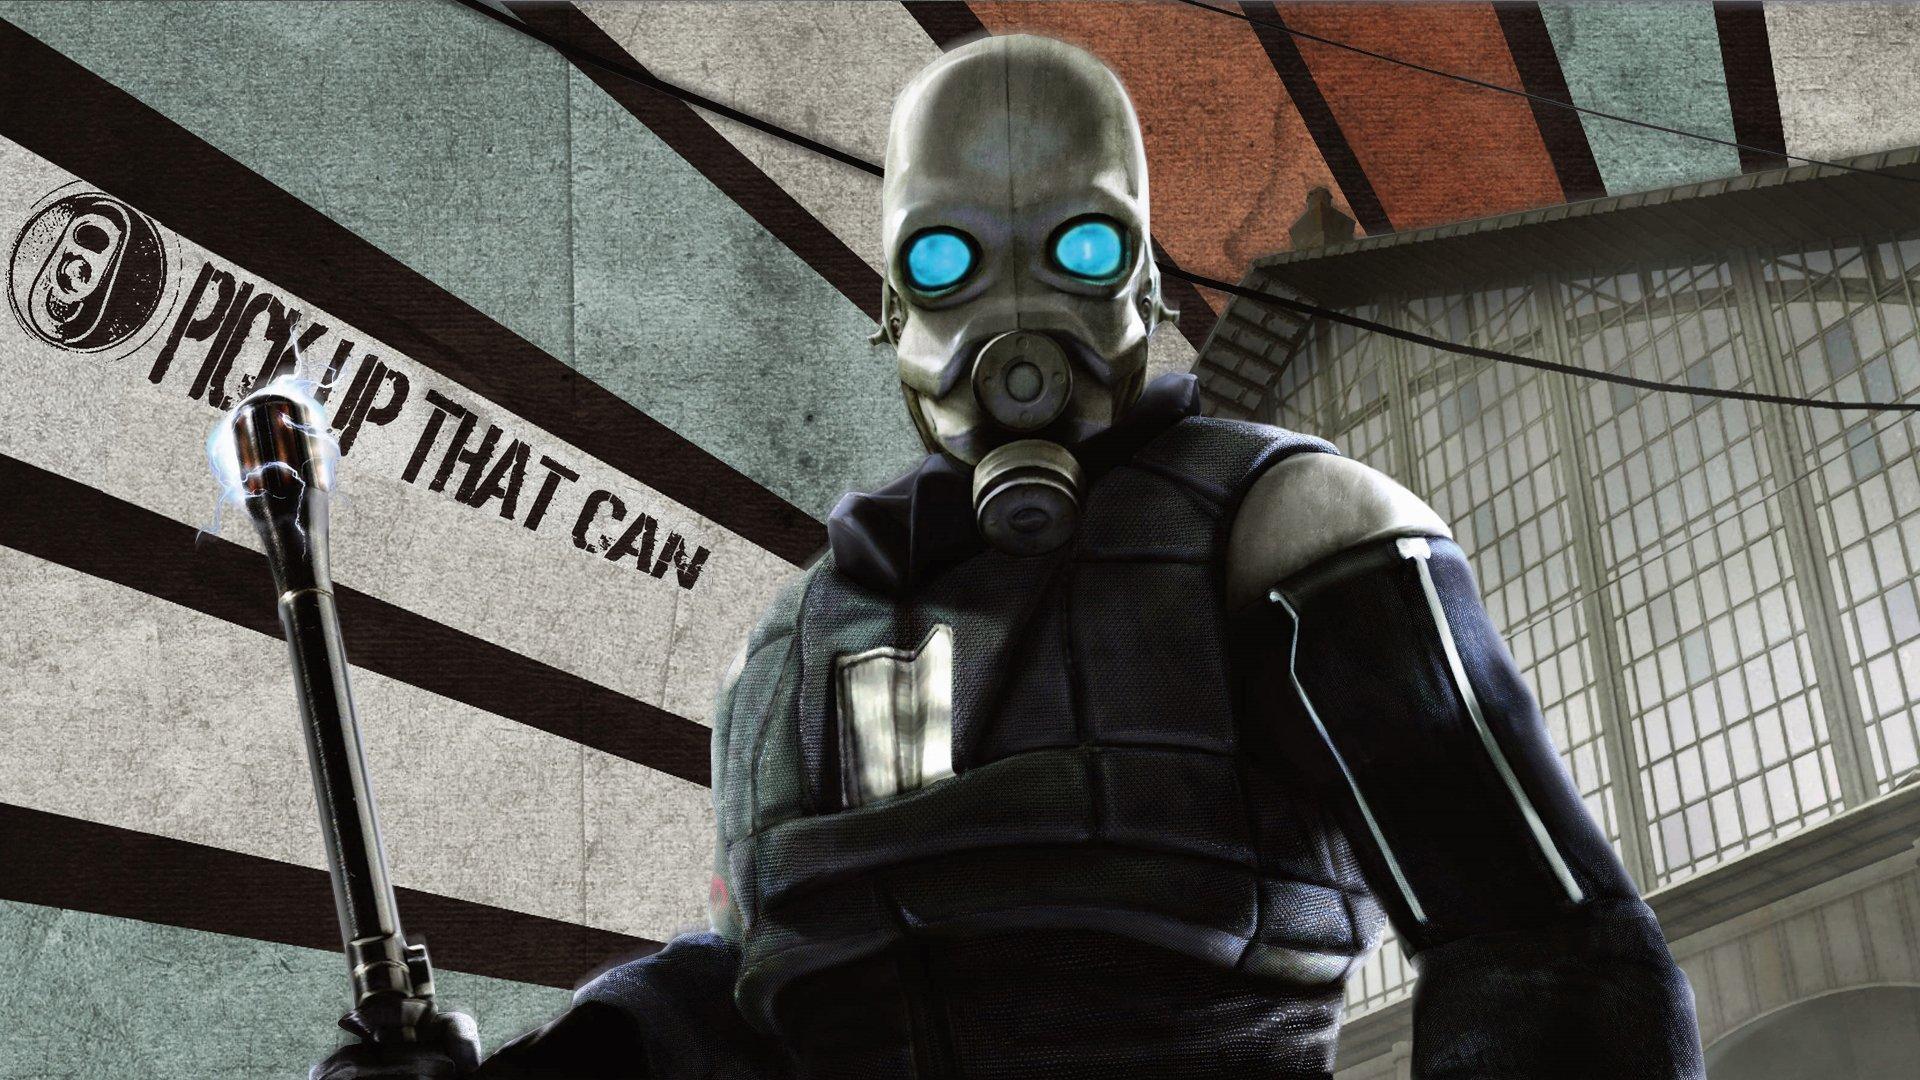 Half Life 2 Combine Wallpaper: Half Life 2 Quotes. QuotesGram